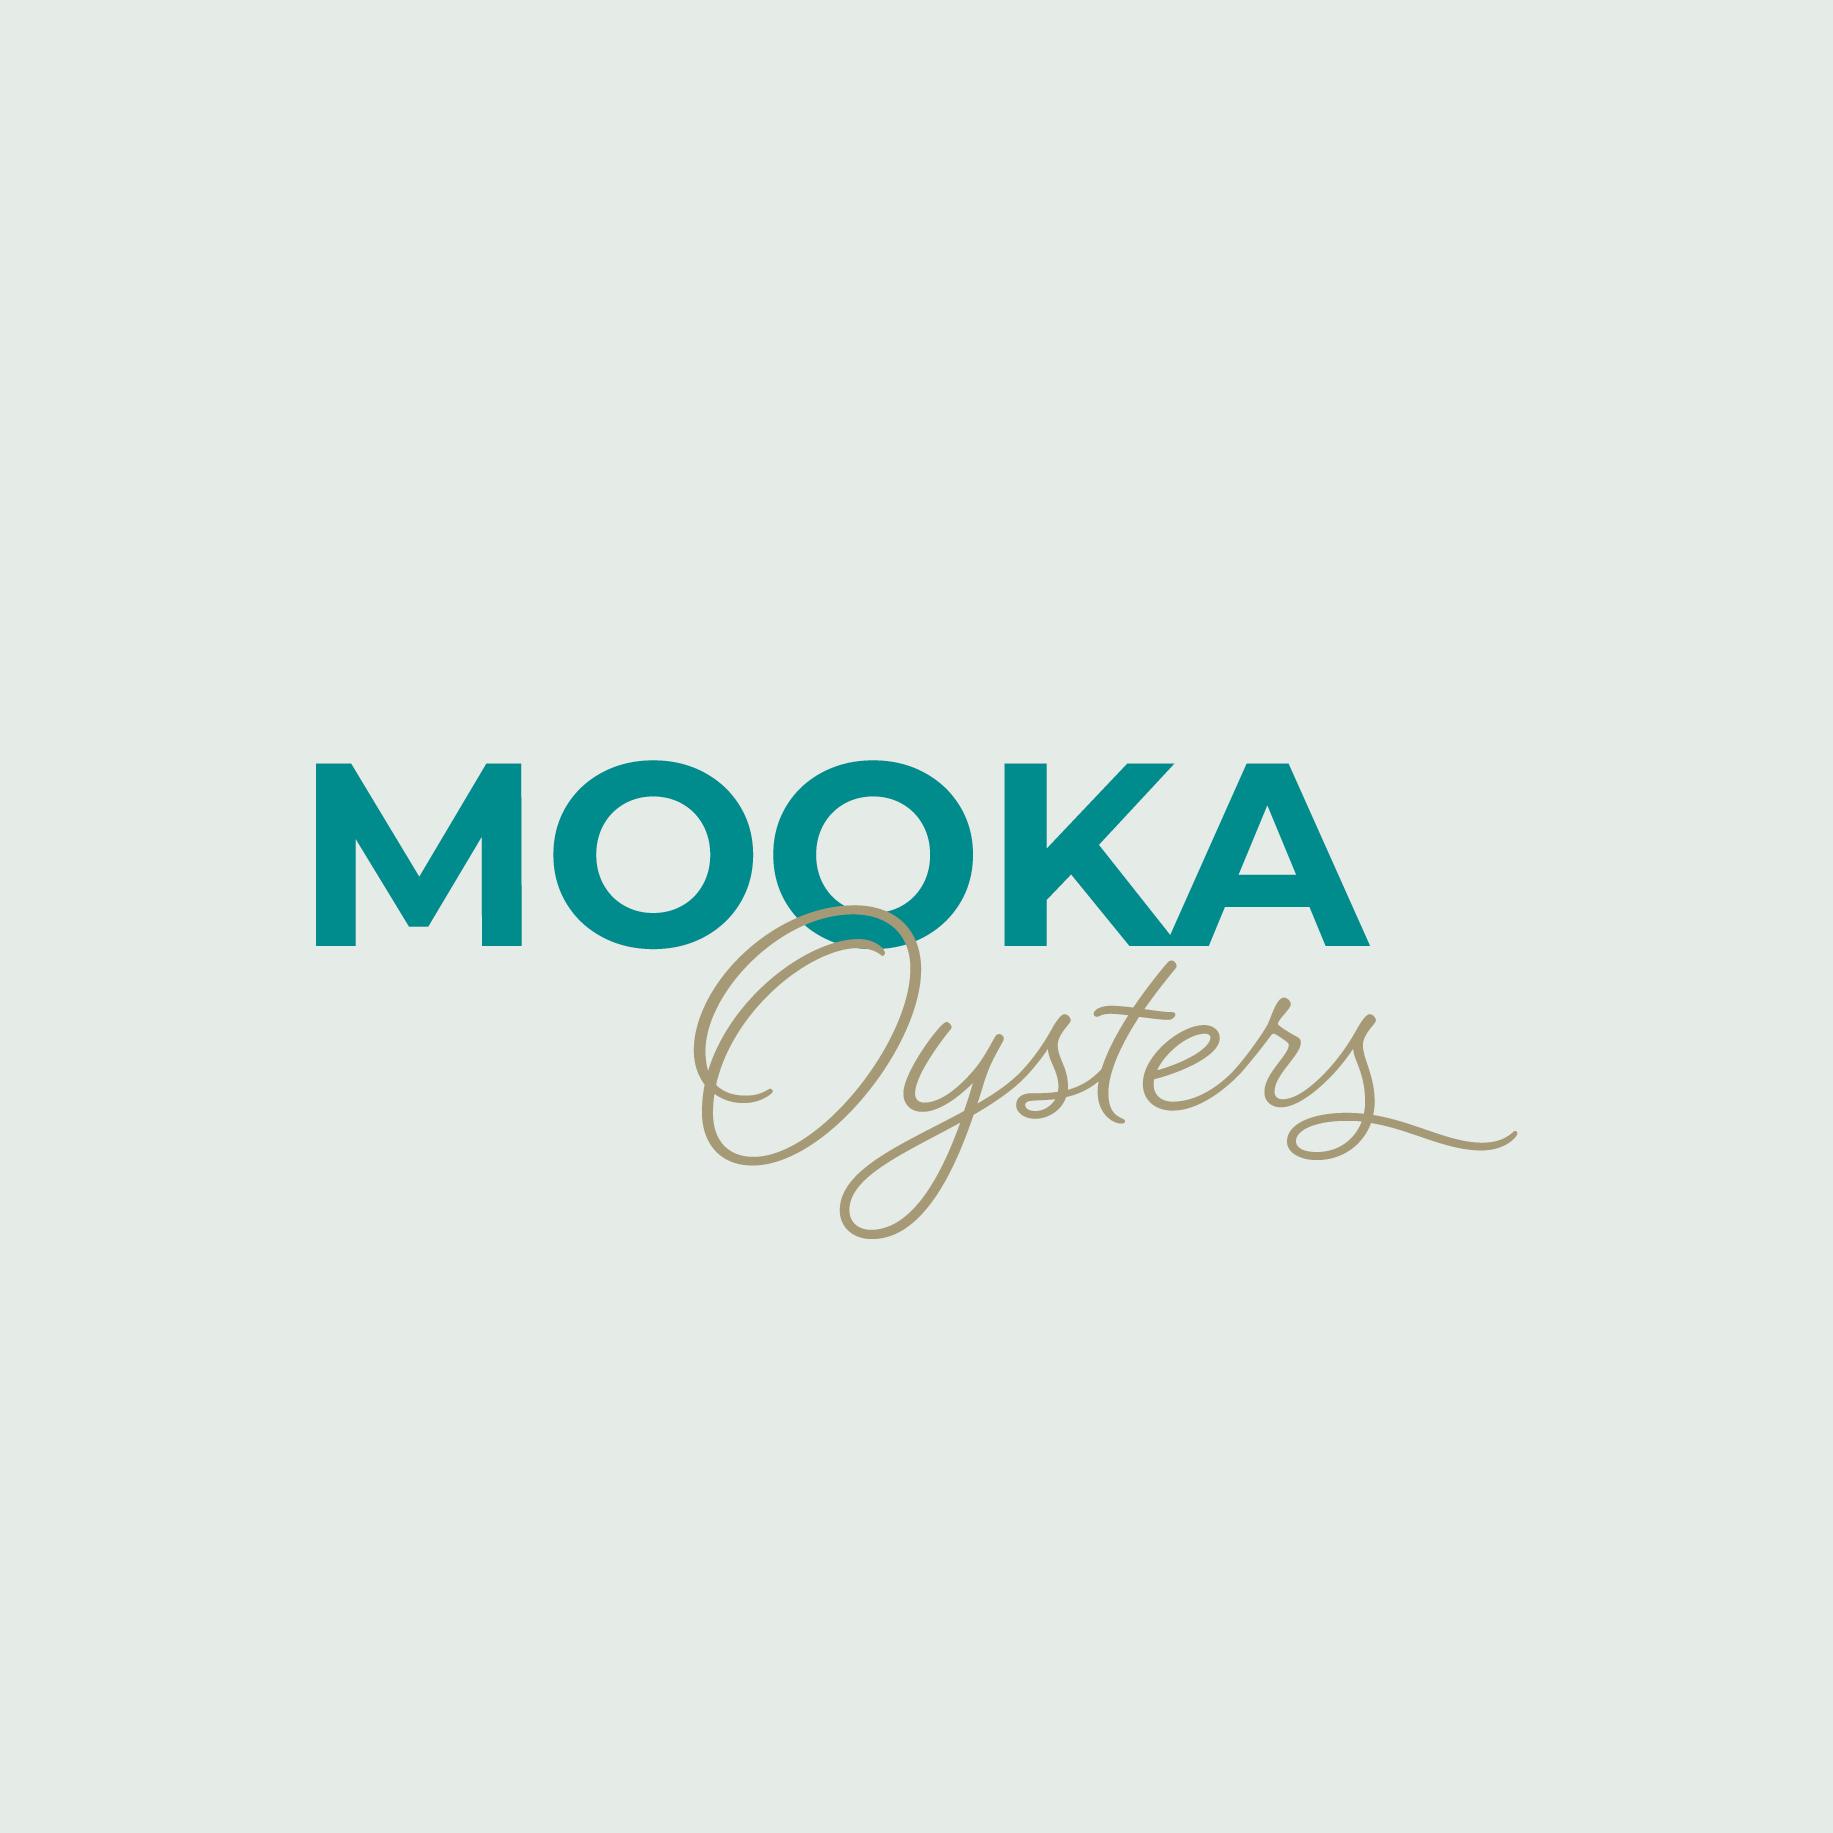 Mooka Oysters Logo Design